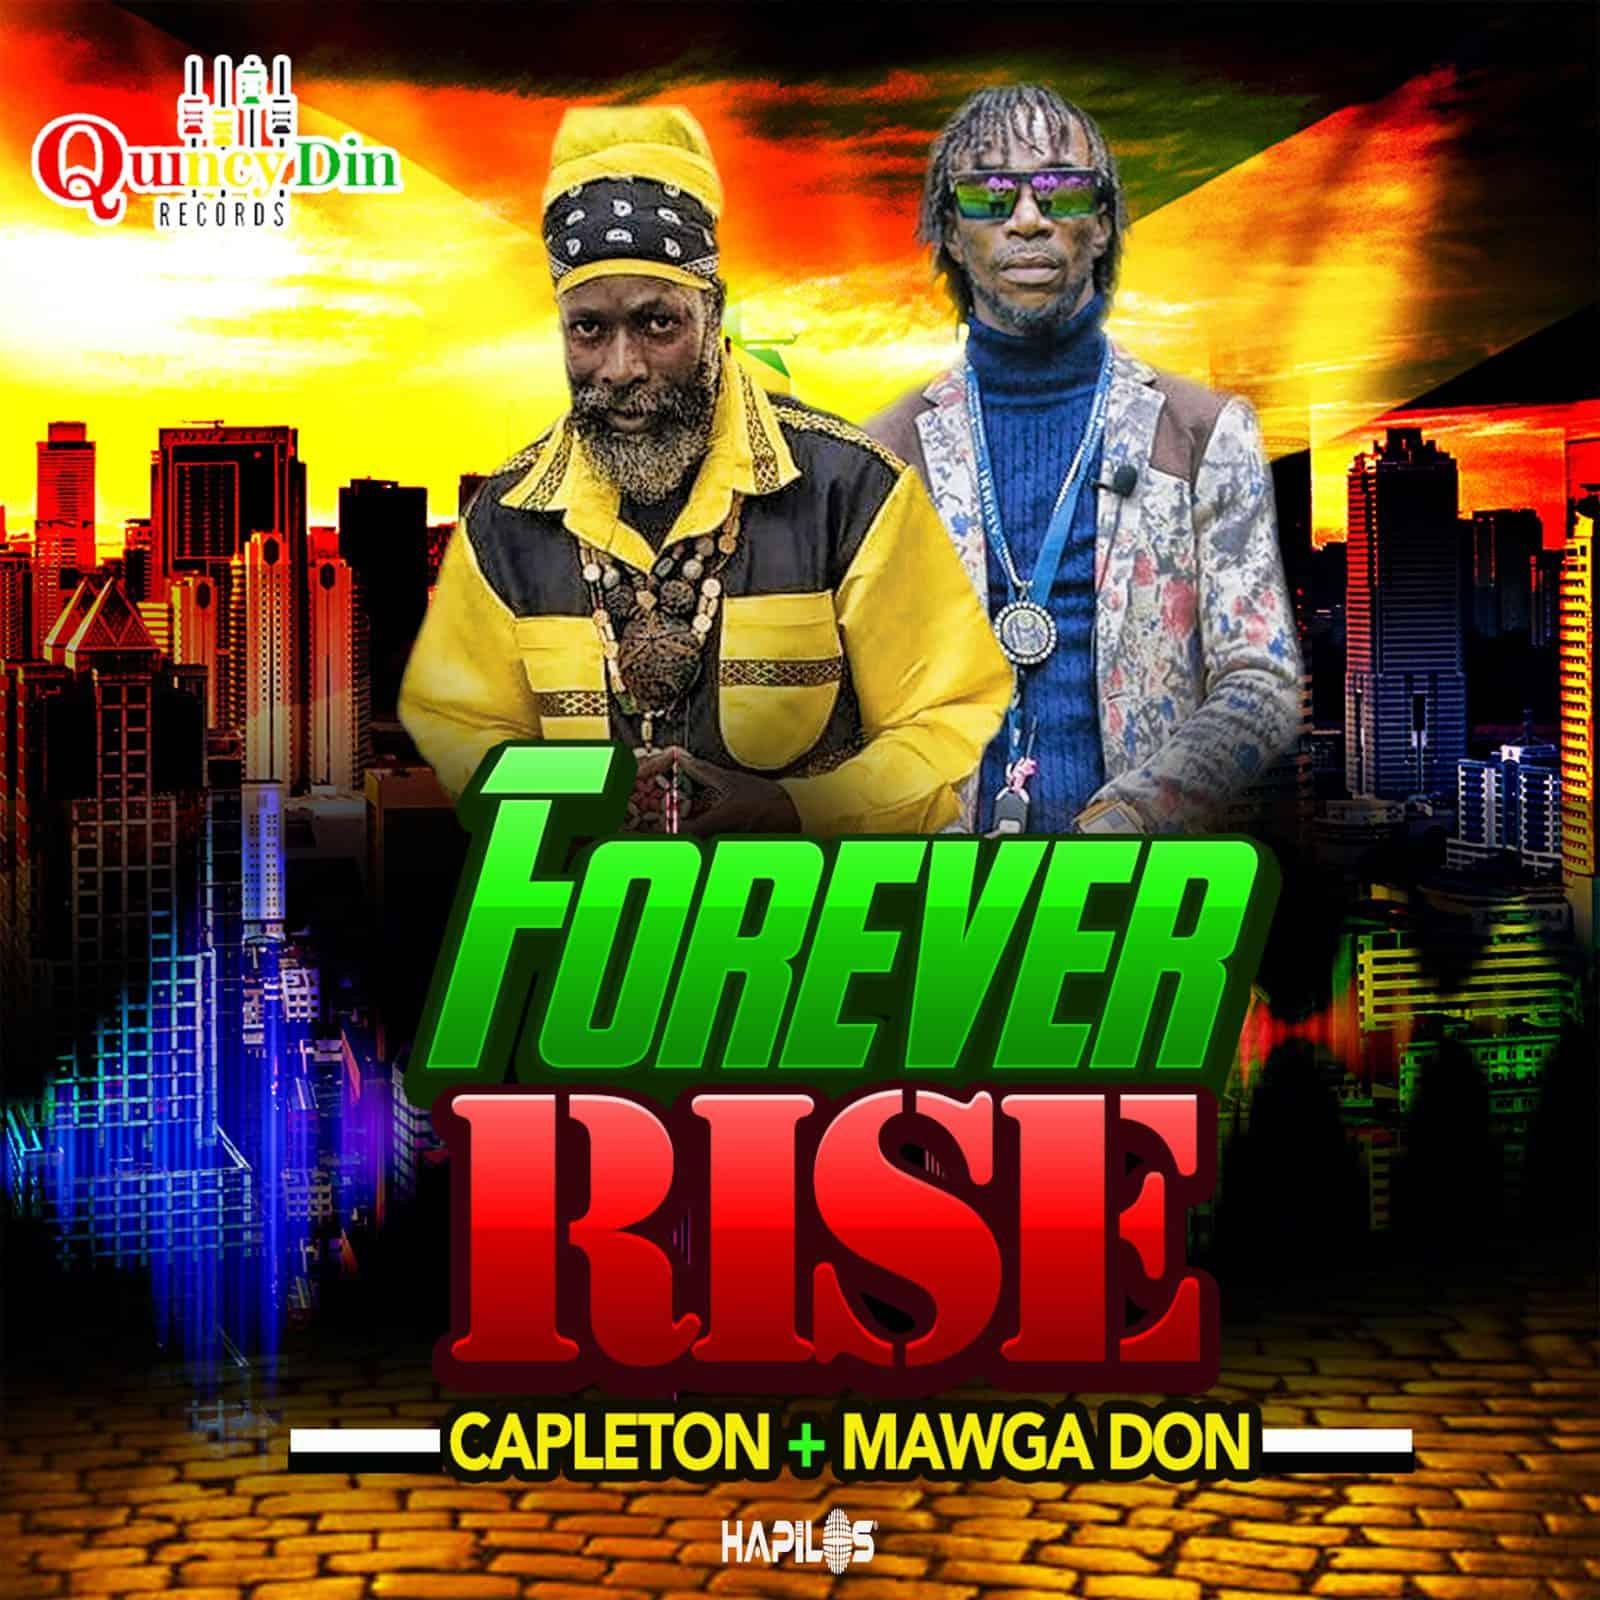 Capleton & Mawga Don - Forever Rise - Quincy Din Records